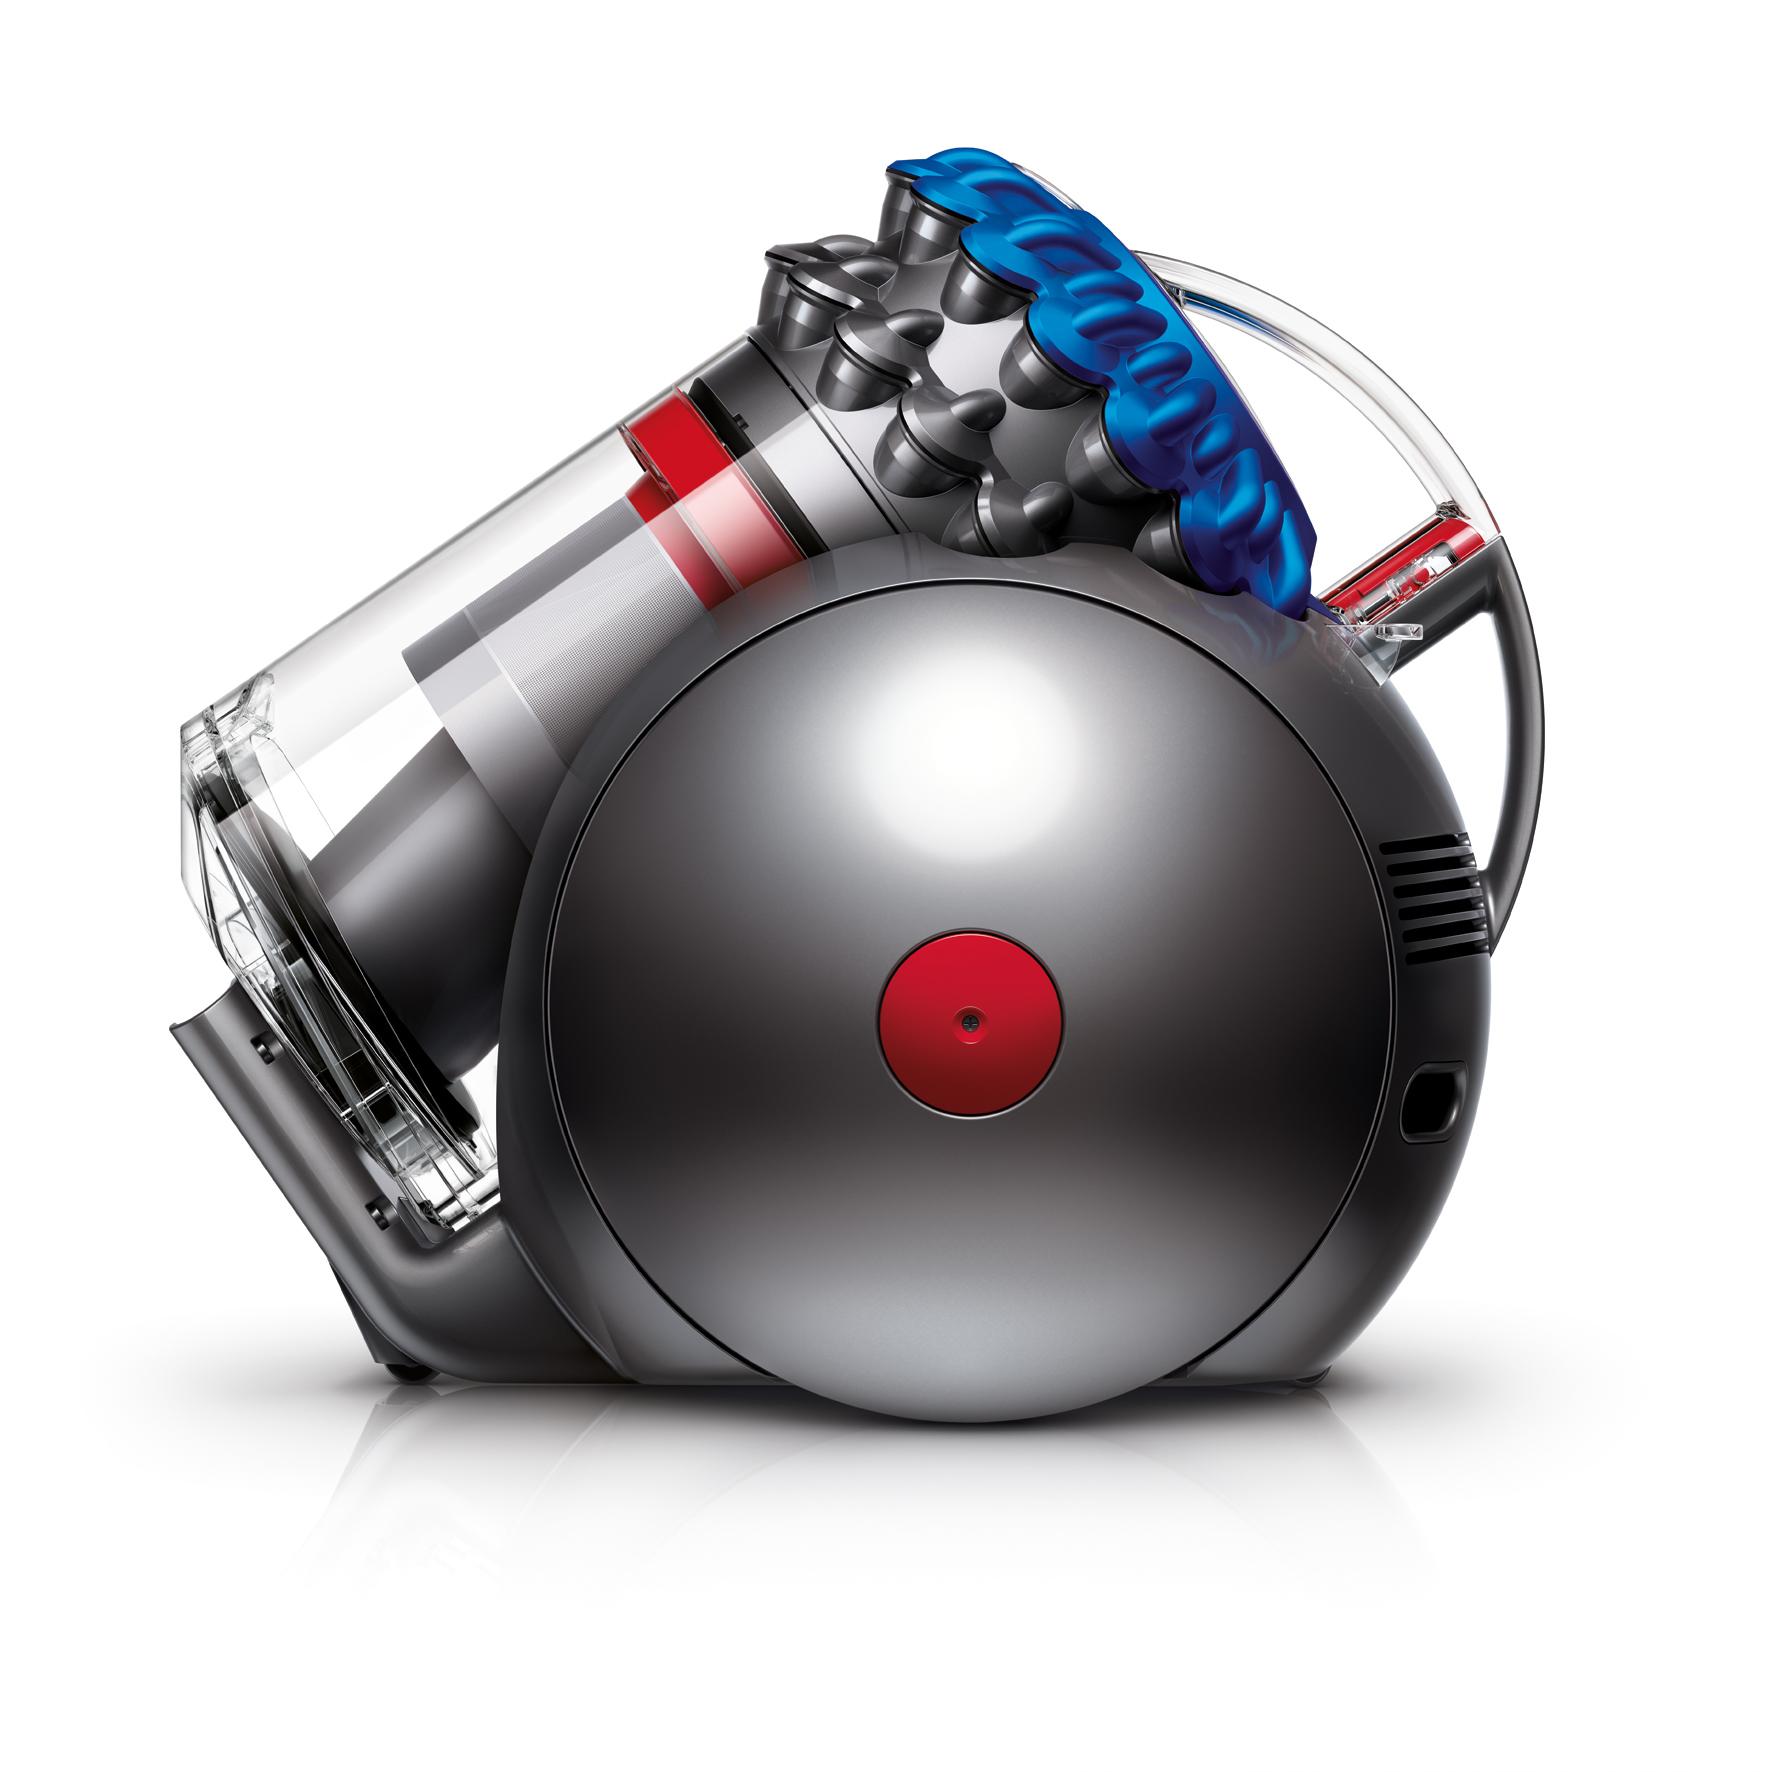 Dyson-Big-Ball-Multifloor-Extra-Aspirateur-A-Cylindre-Filtre-Bleu-Gris-Acier